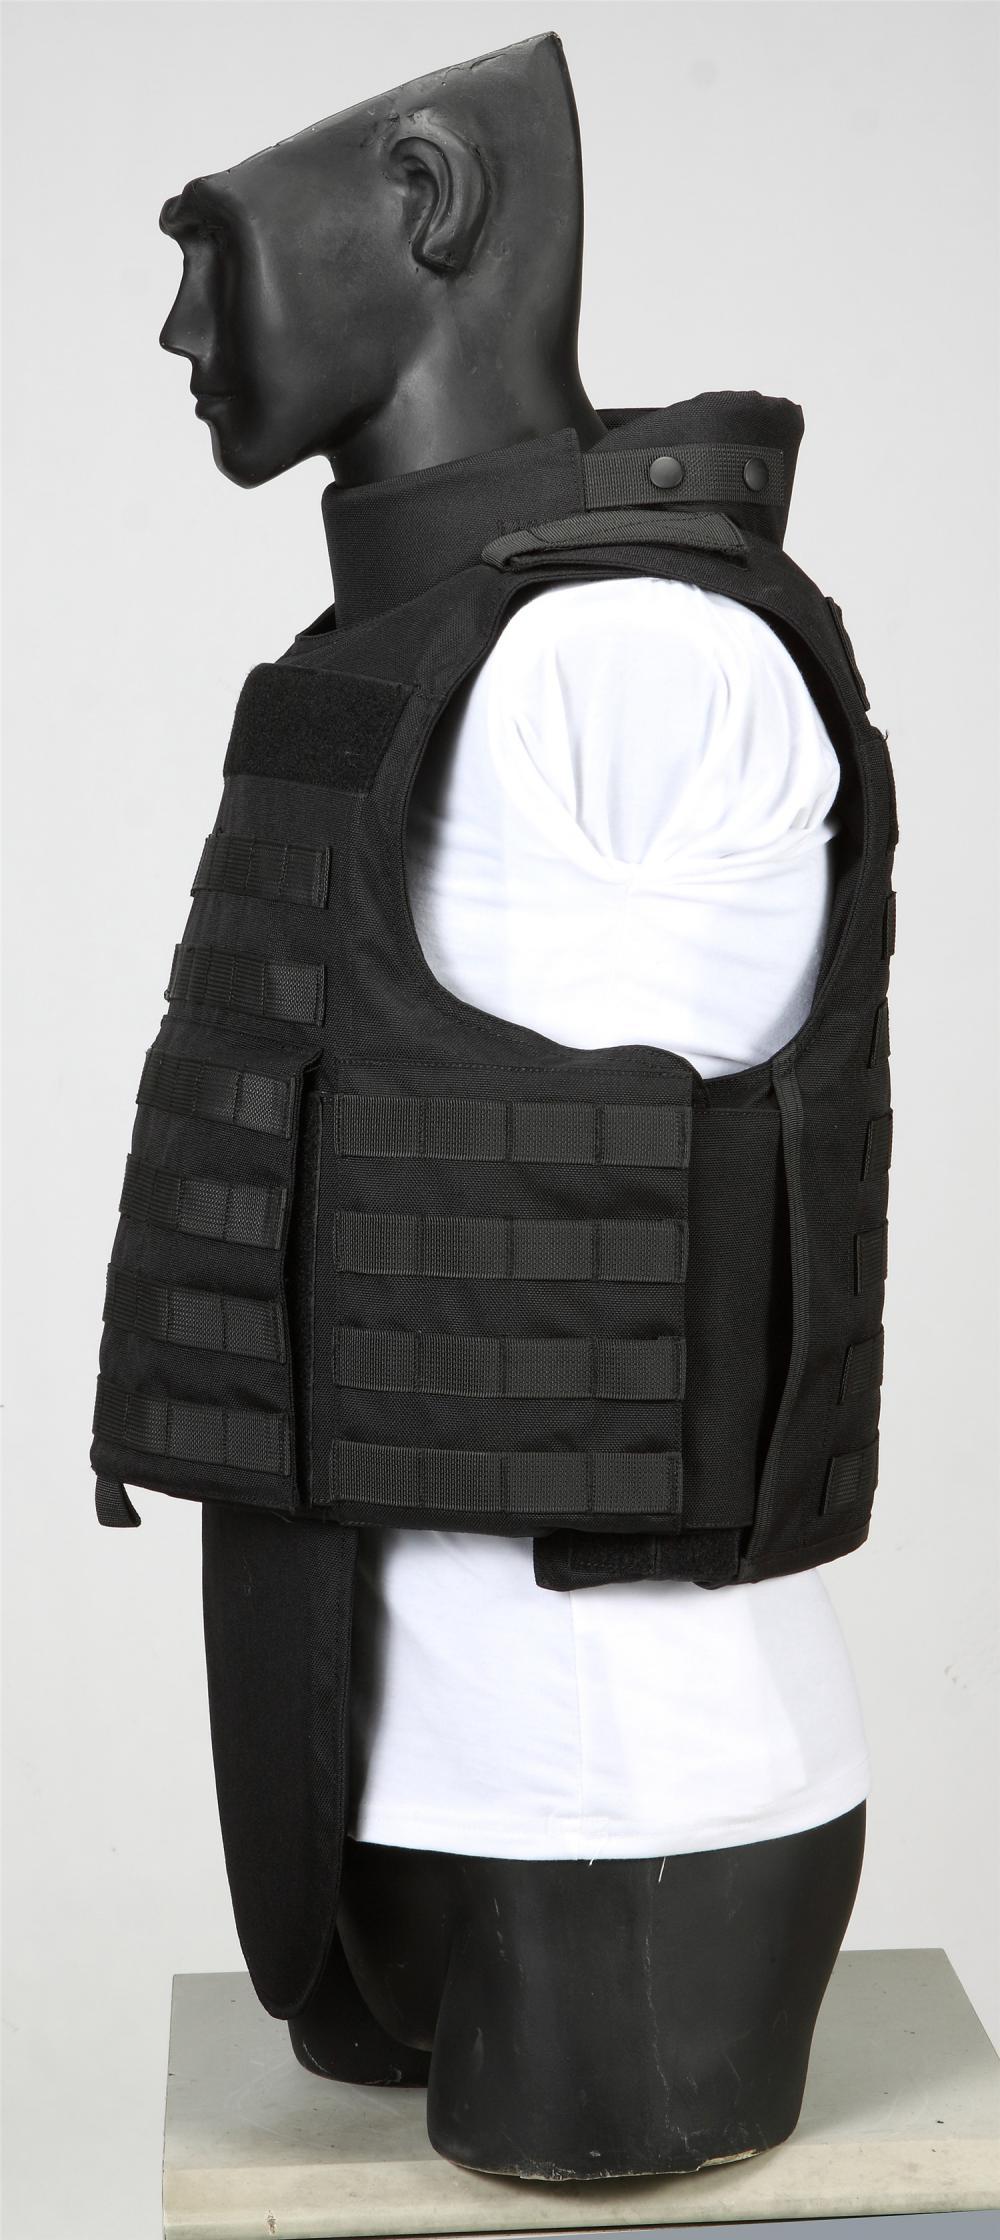 Gilet anti- stab & pare-balles de SWAT